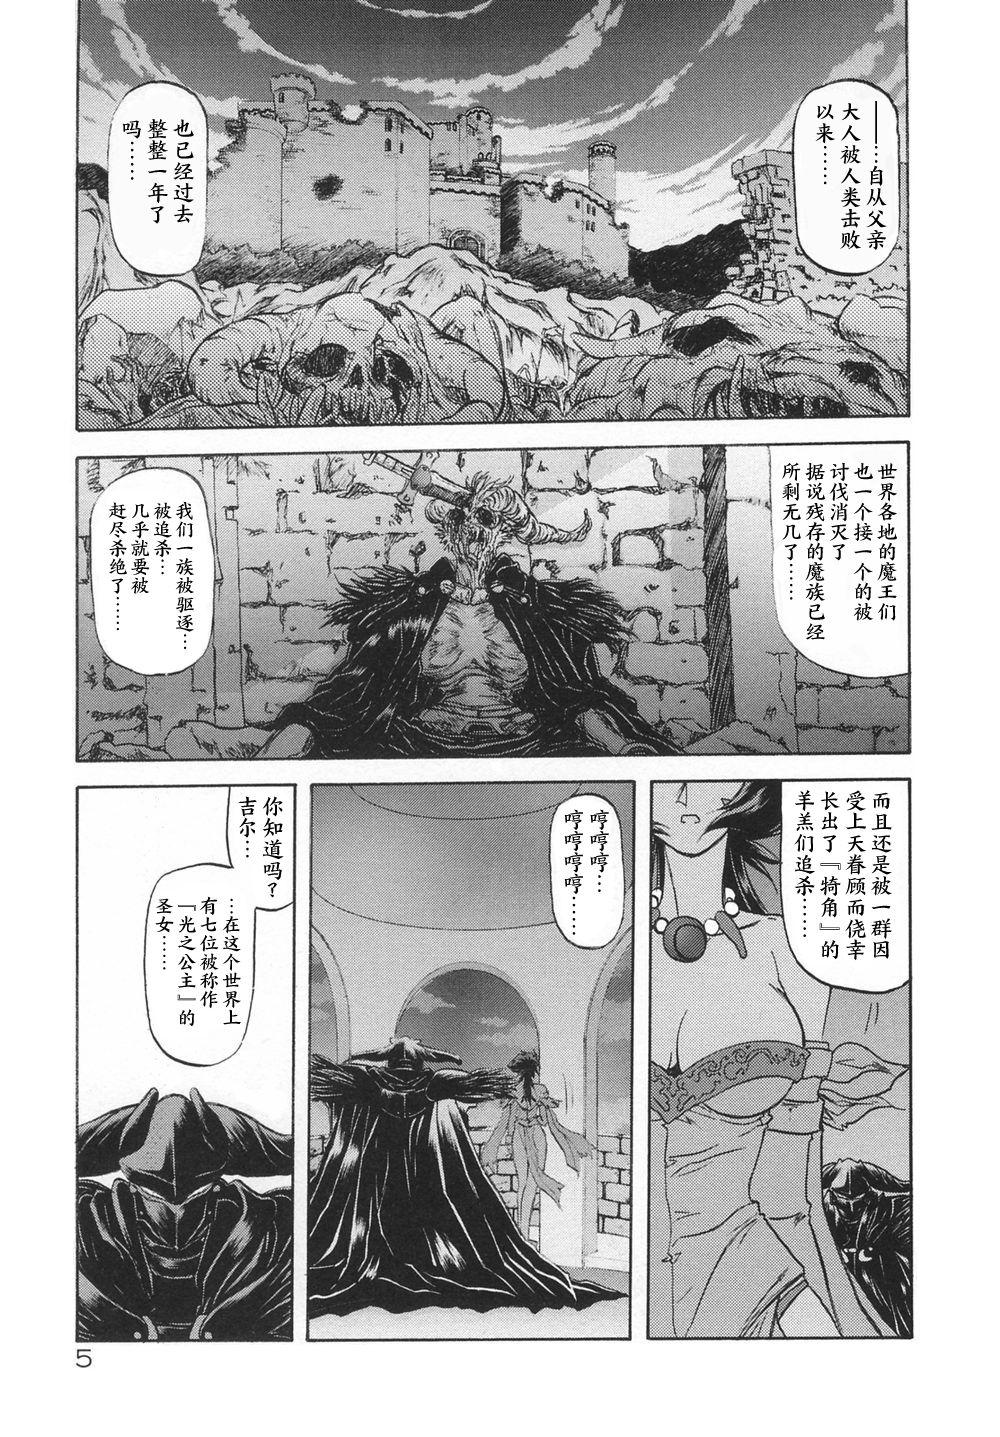 [Sanbun Kyoden] Shichisai no Lamuros | The Lamuros of Seven Colors [Chinese] ep.1 10